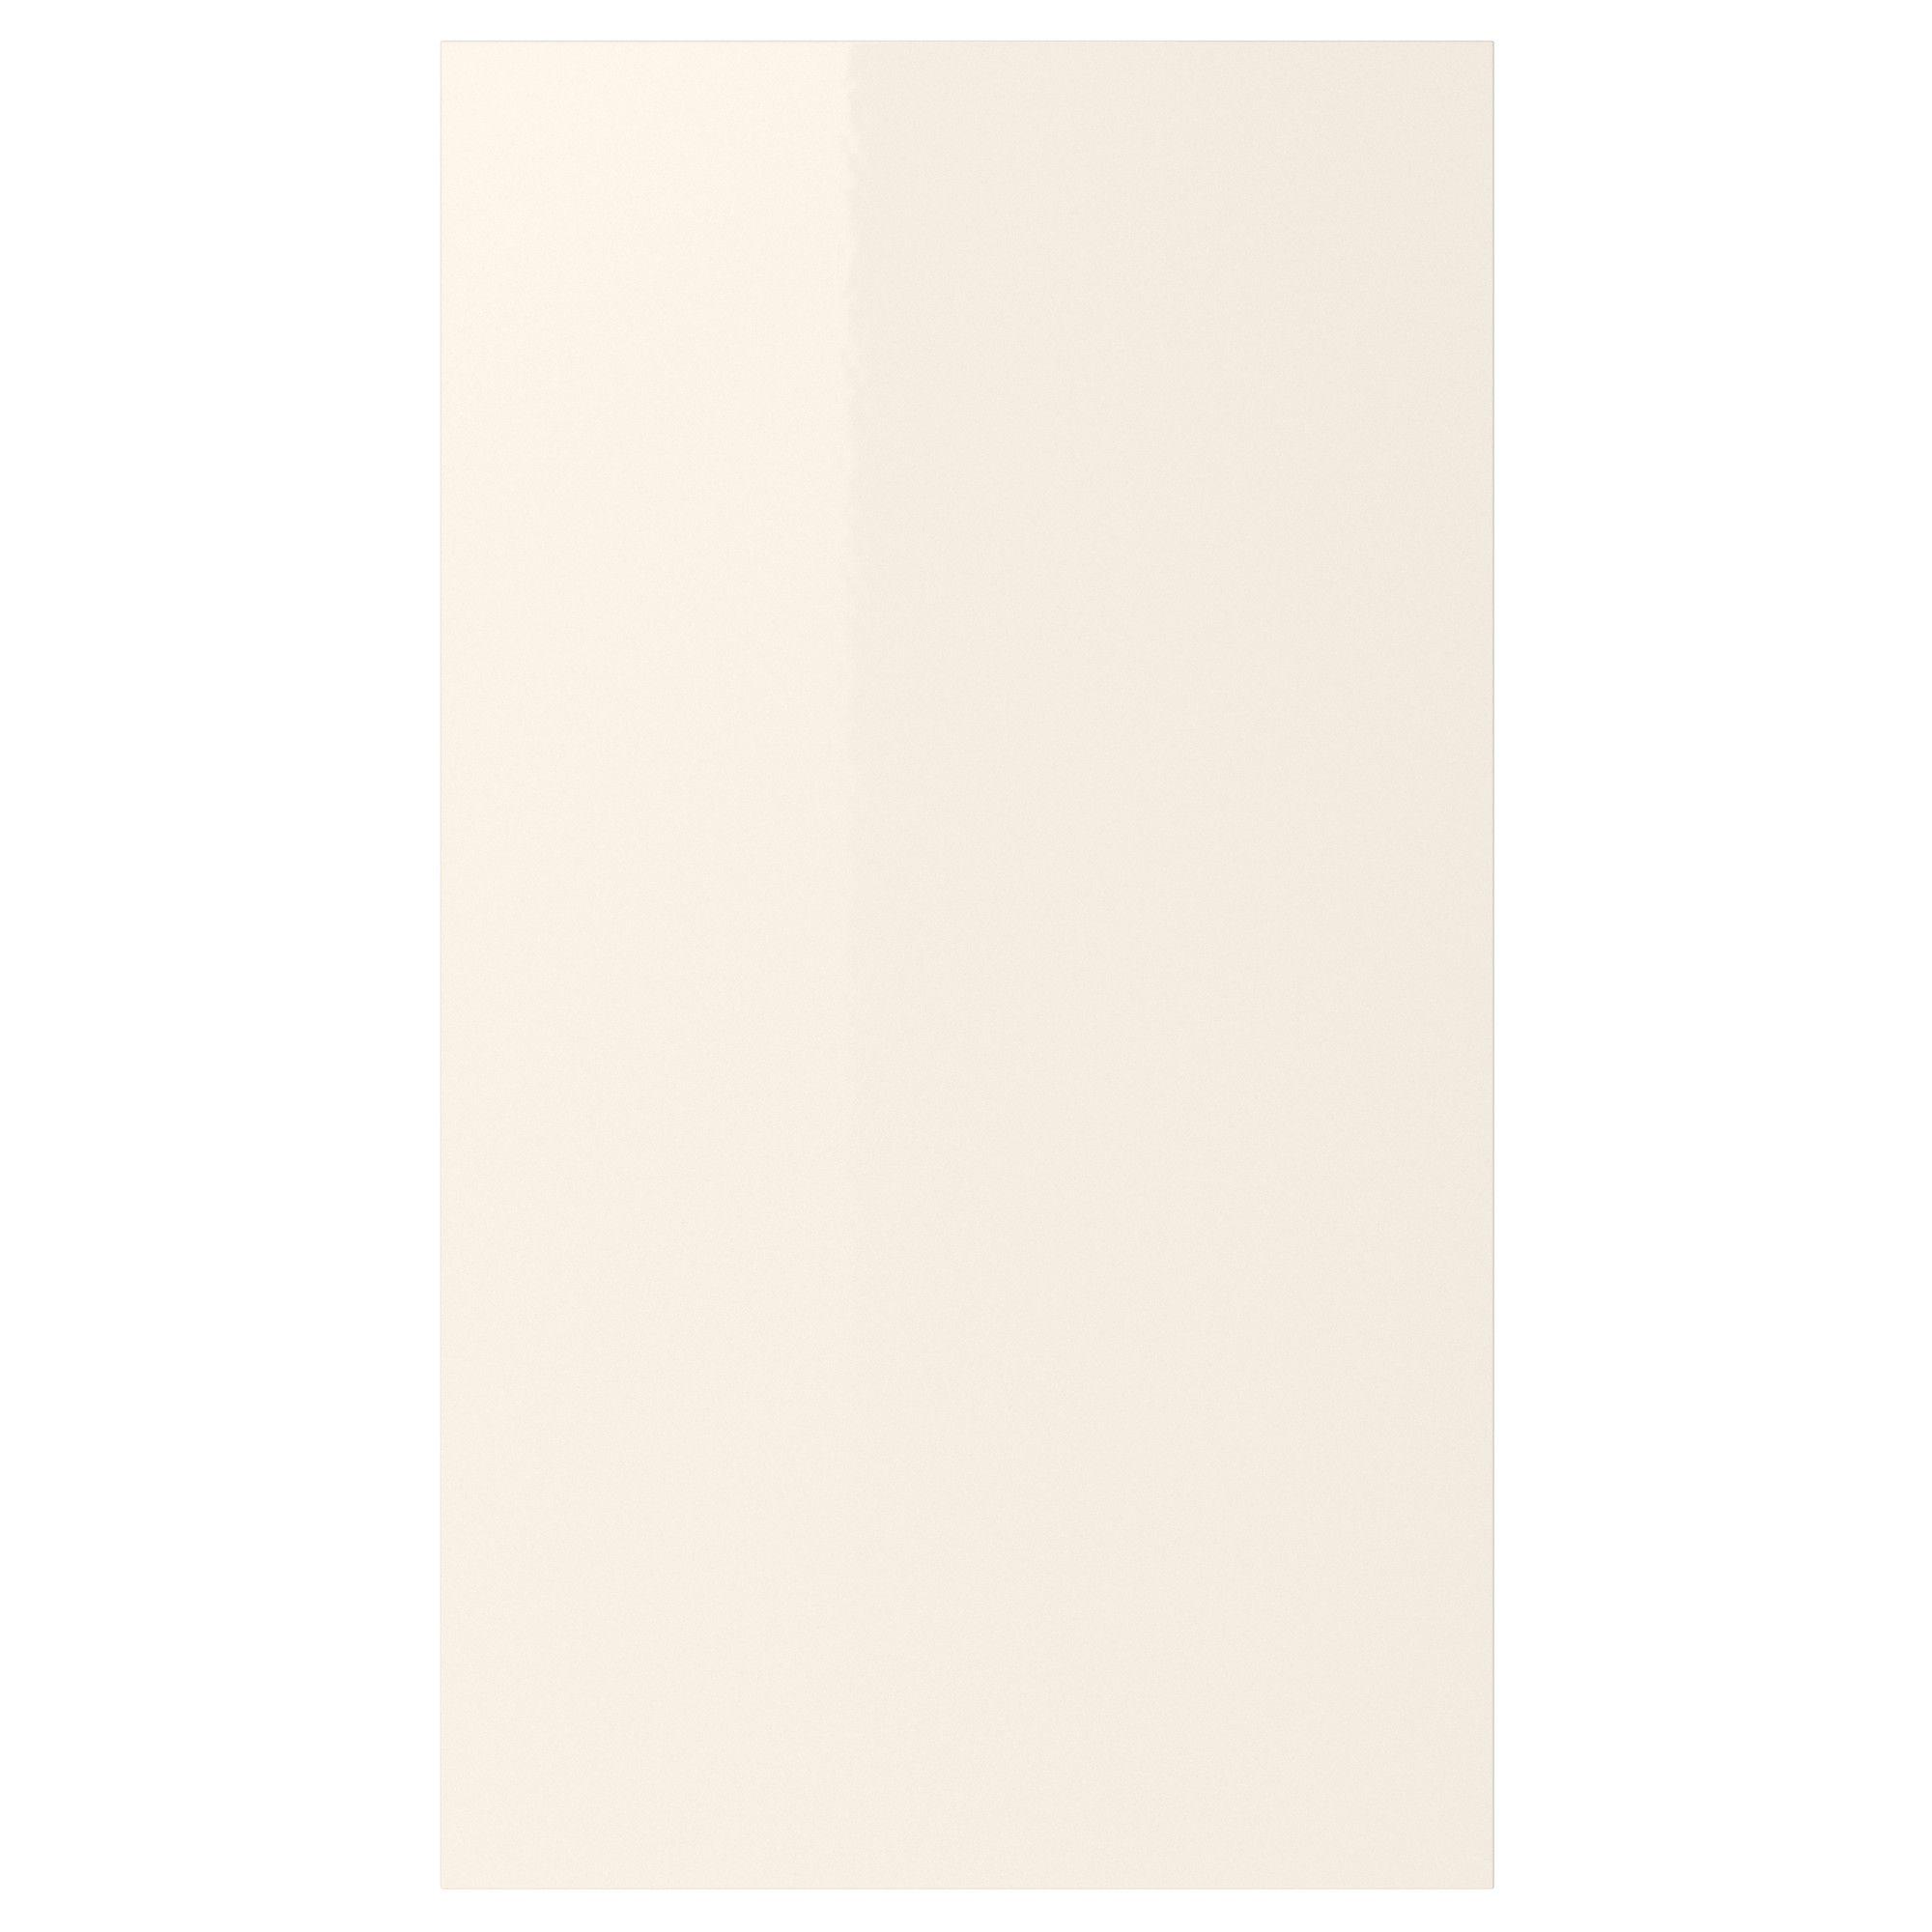 kitchen cabinet doors abstrakt door for corner wall cabinet high gloss cream 17x30 ikea. Black Bedroom Furniture Sets. Home Design Ideas